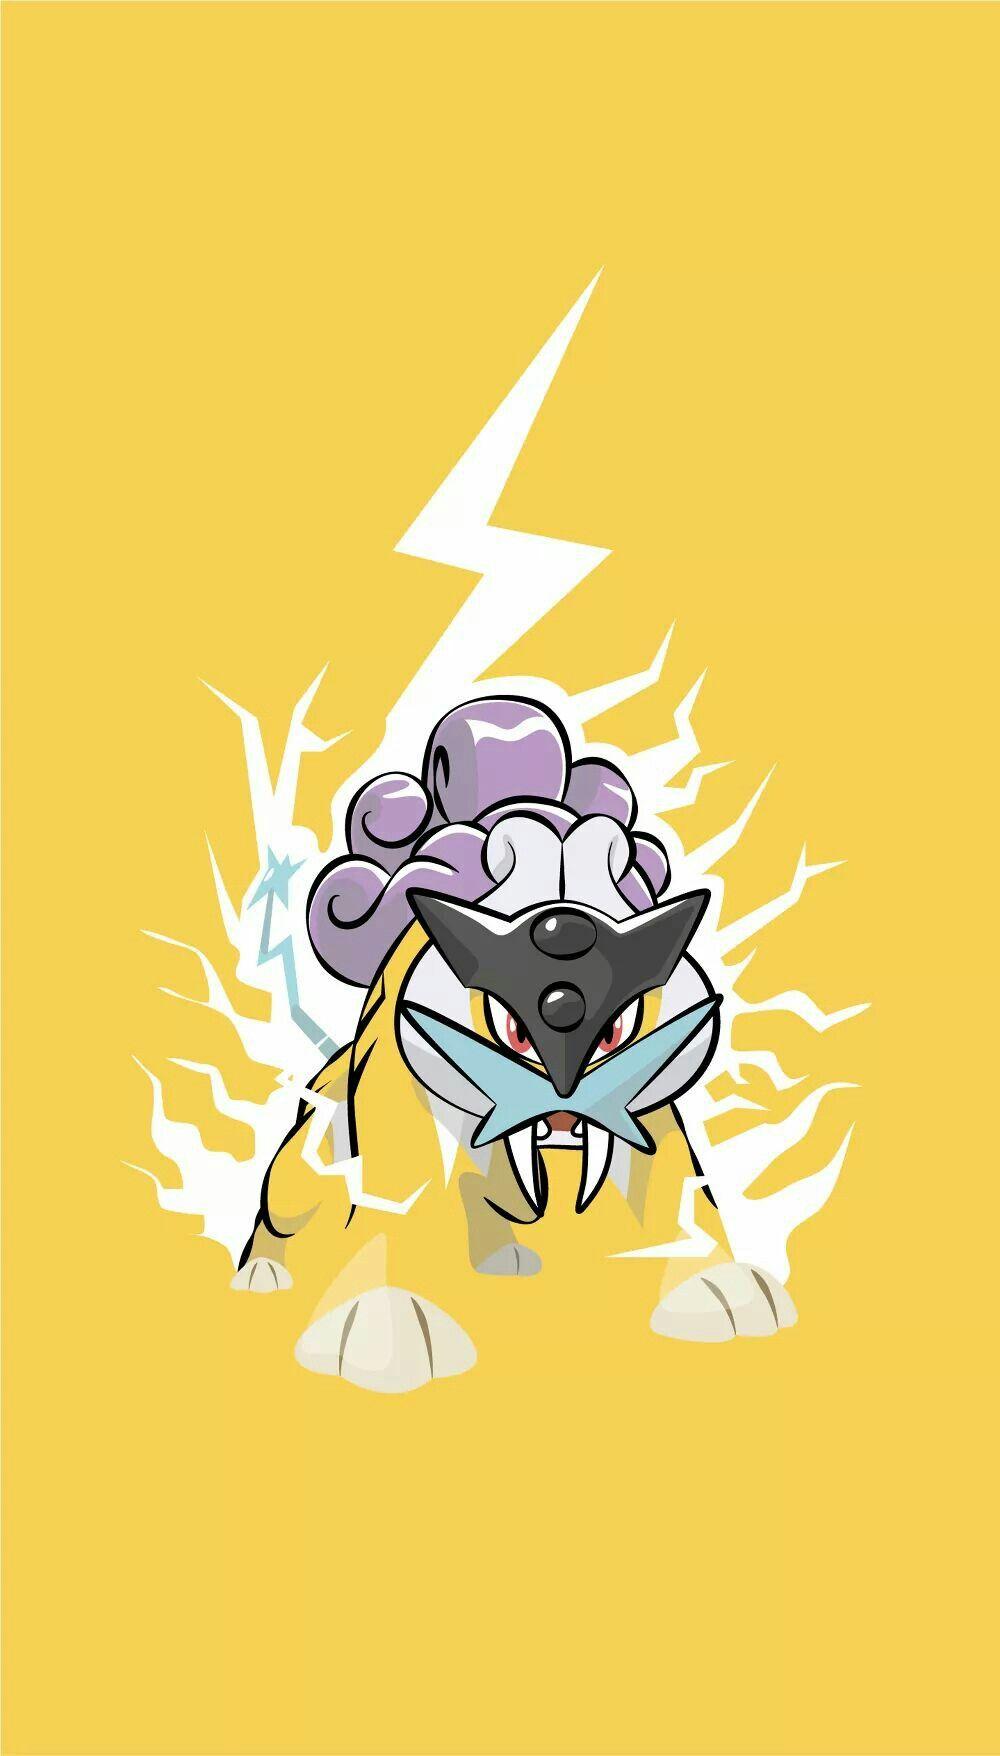 pokémon go」おしゃれまとめの人気アイデア|pinterest |Álvaro tim